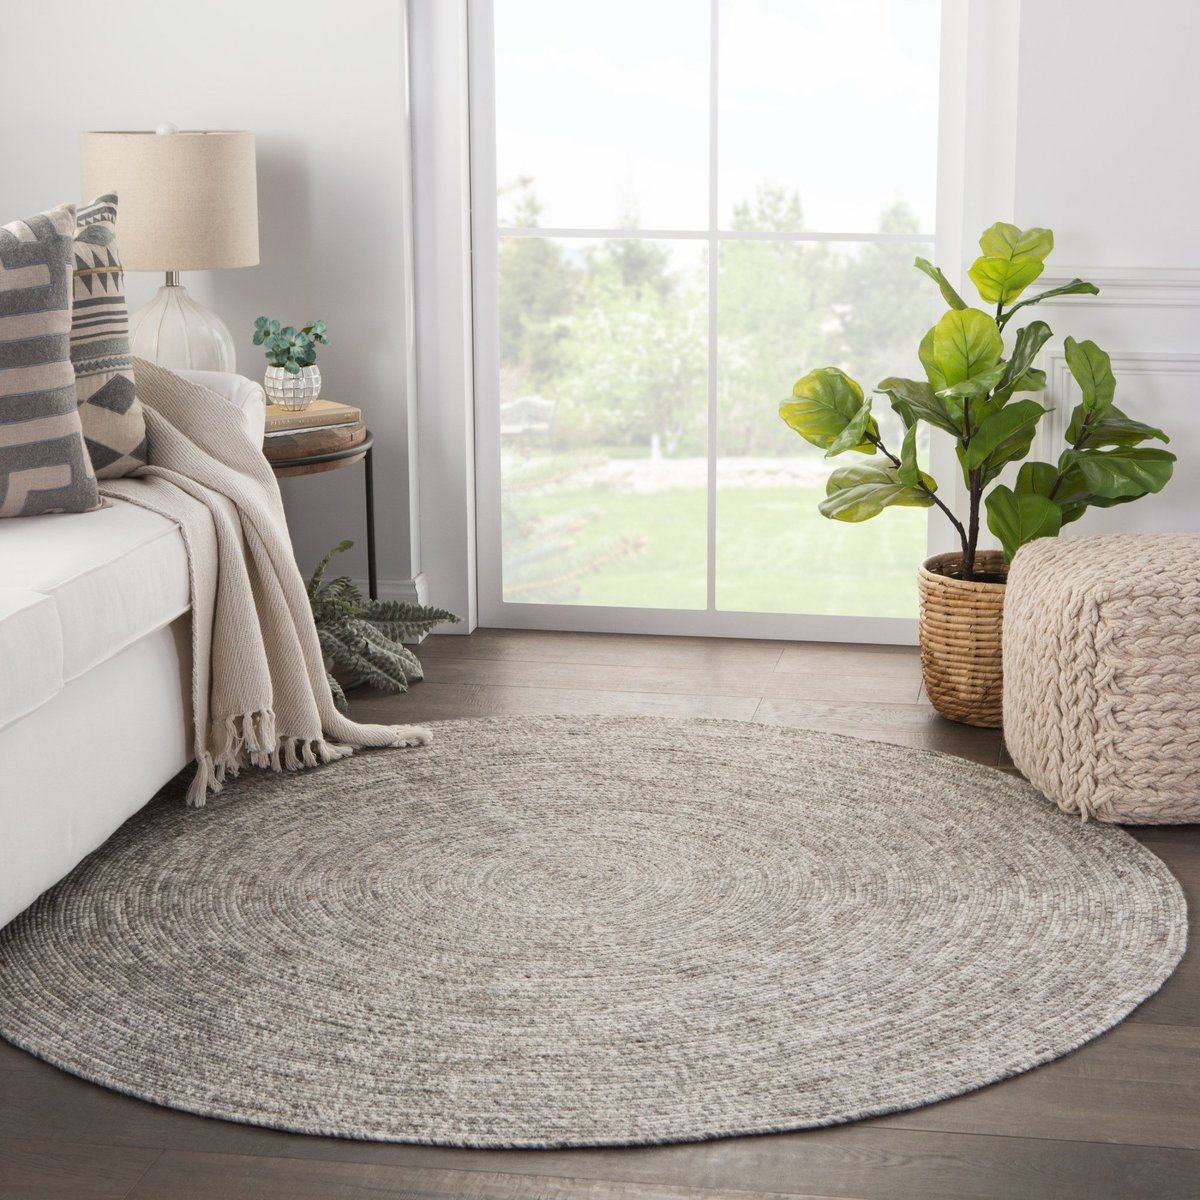 Small and Cozy Grey Living Room Decor Ideas